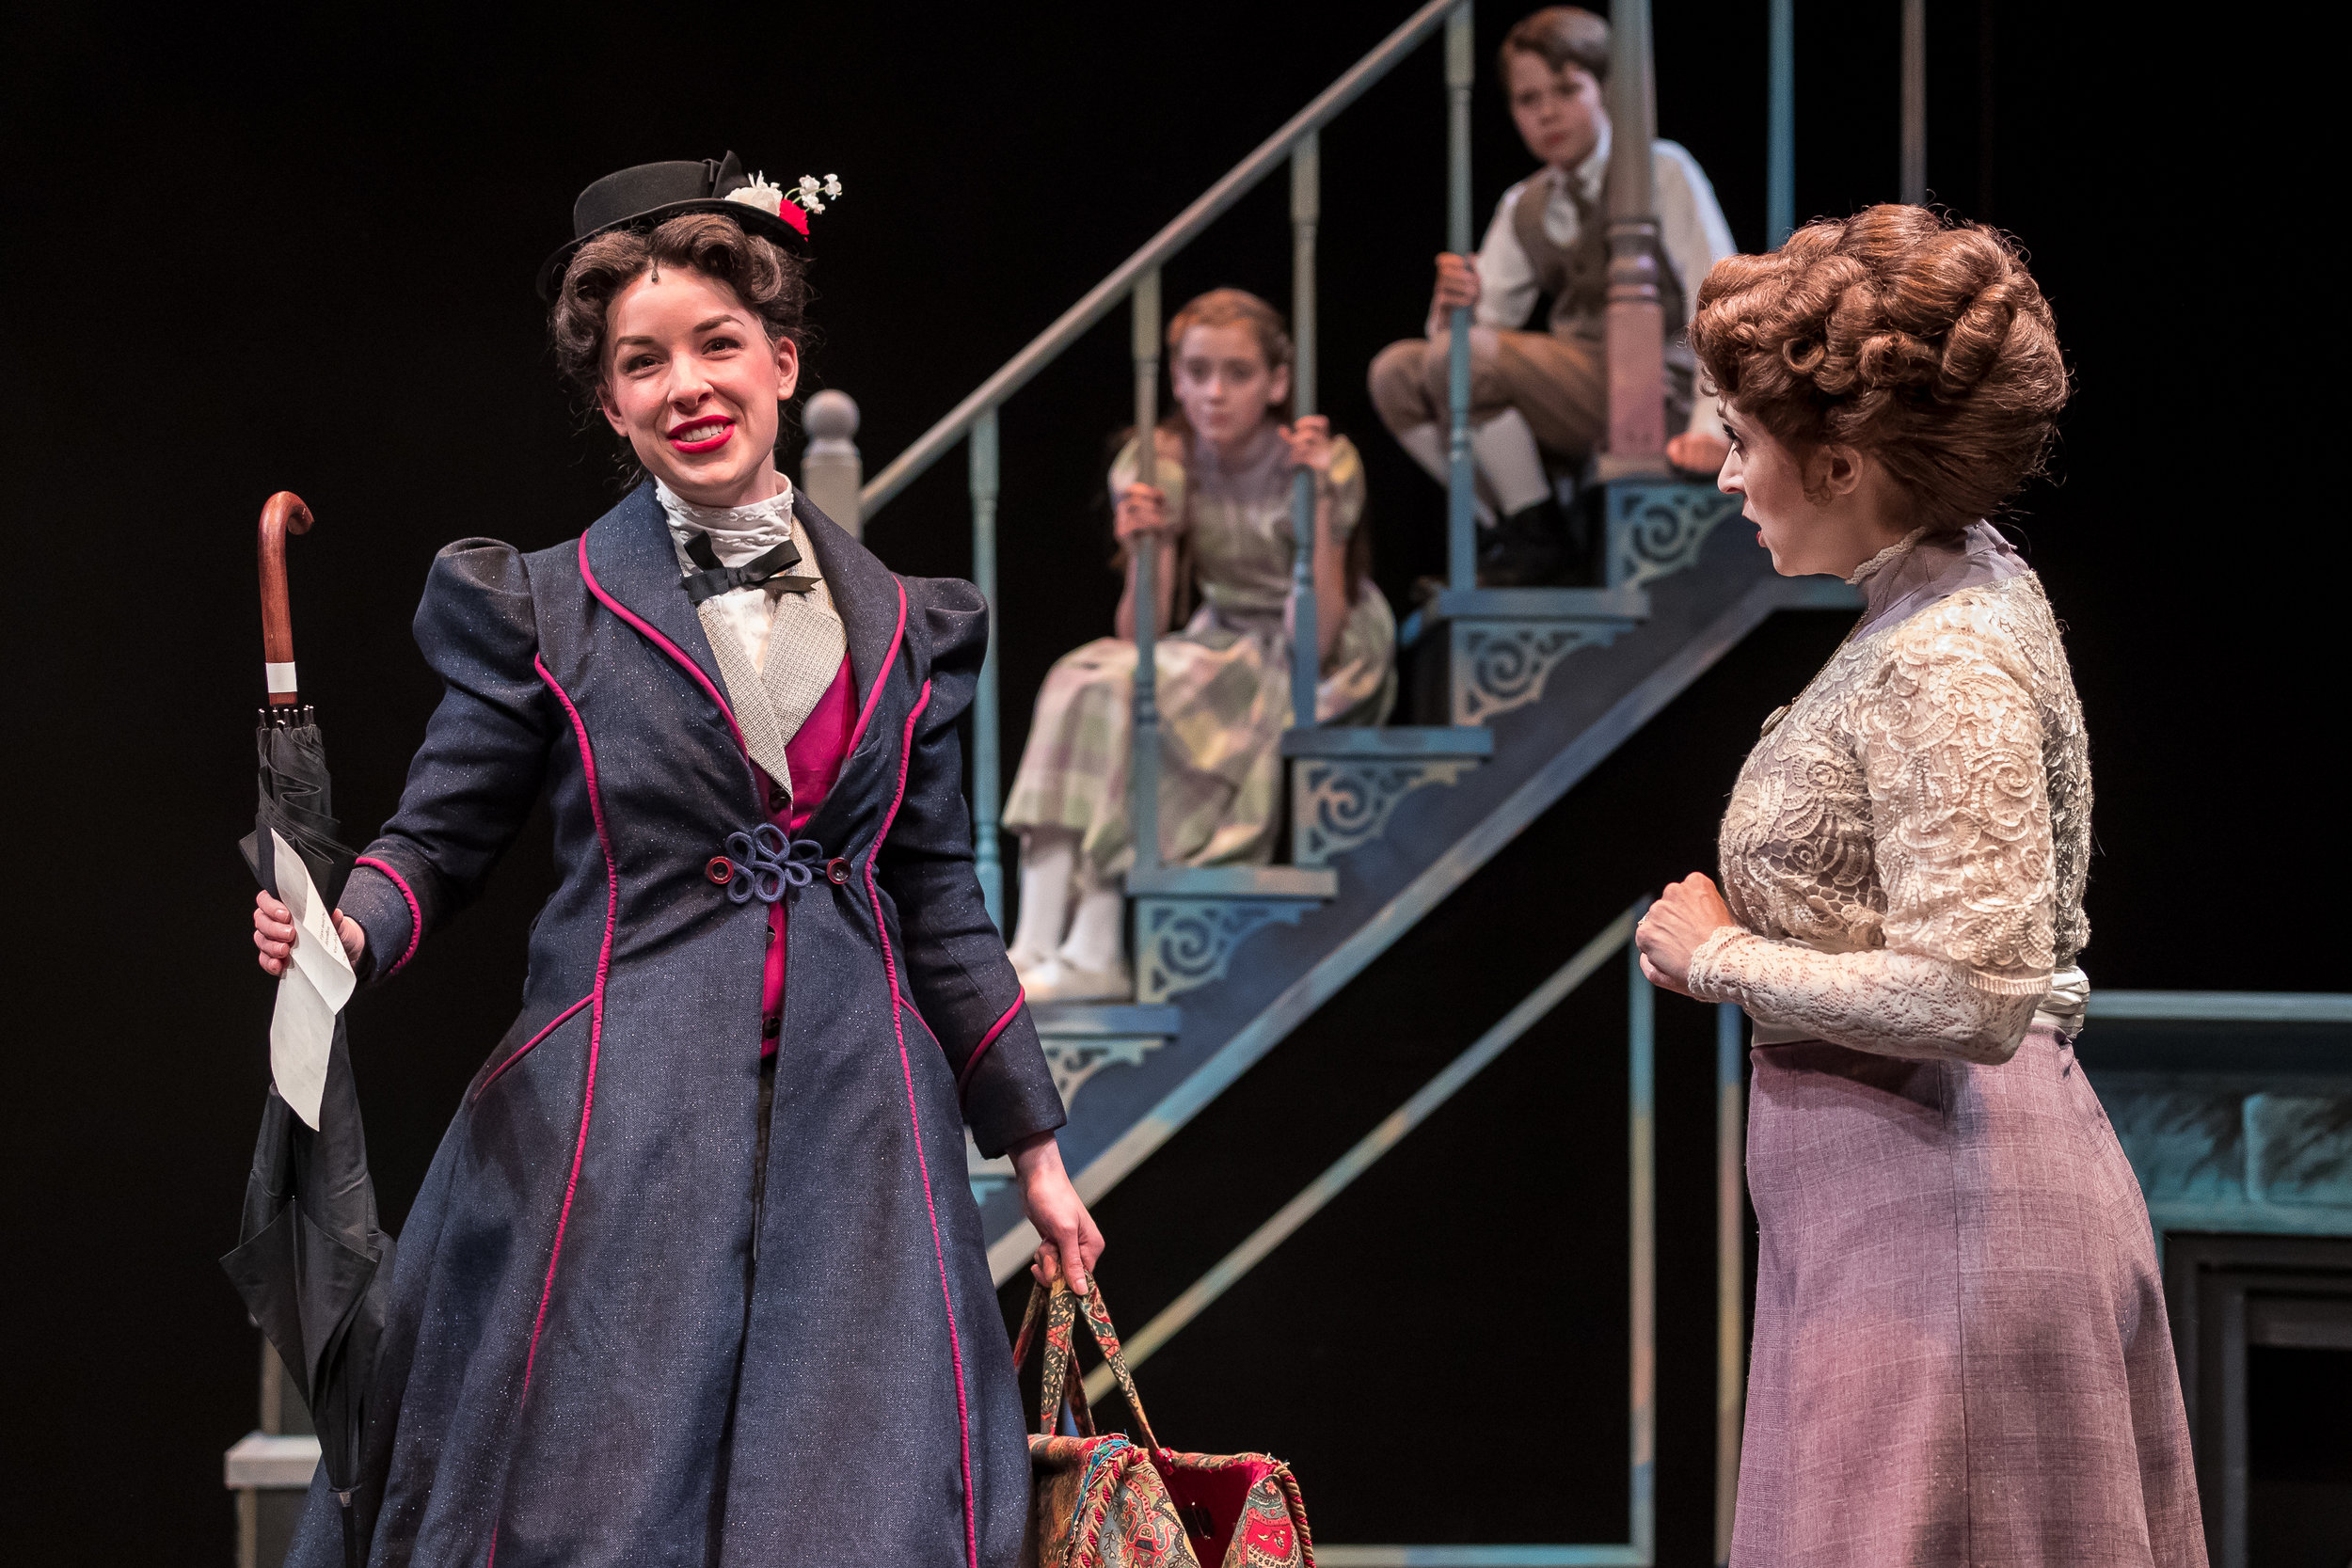 Mercury Theater, Mary Poppins - Nicole Armold (Mary Poppins), Pearle Bramlett (Jane), Casey Lyons (Michael), Cory Goodrich (Mrs. Banks) - Brett A. Beiner.jpg